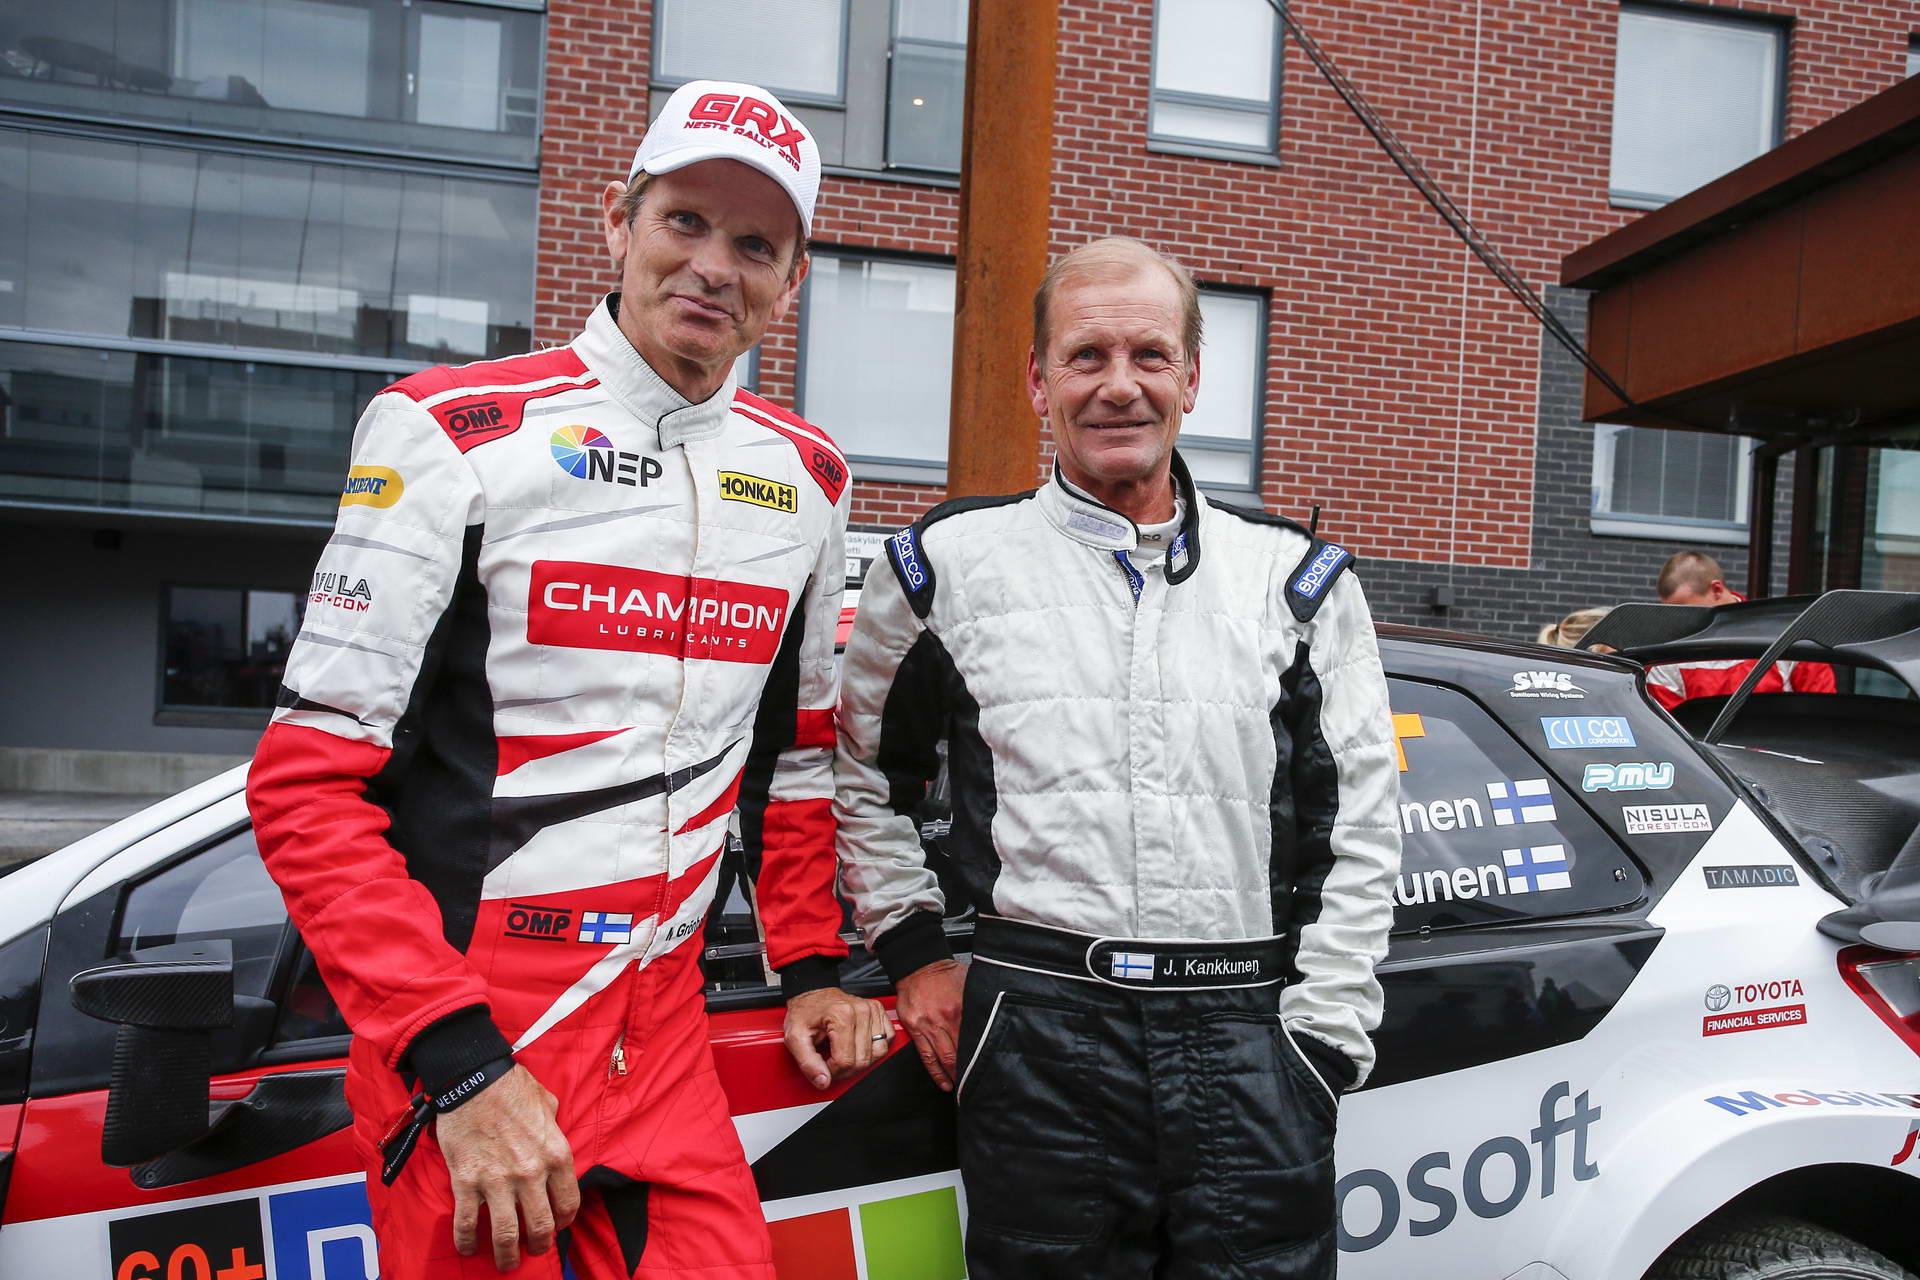 Marcus Gronholm-Juha Kankkunen: 6 Παγκόσμια Πρωταθλήματα και 10 νίκες στο Ράλλυ Φινλανδίας, σε μια φωτογραφία